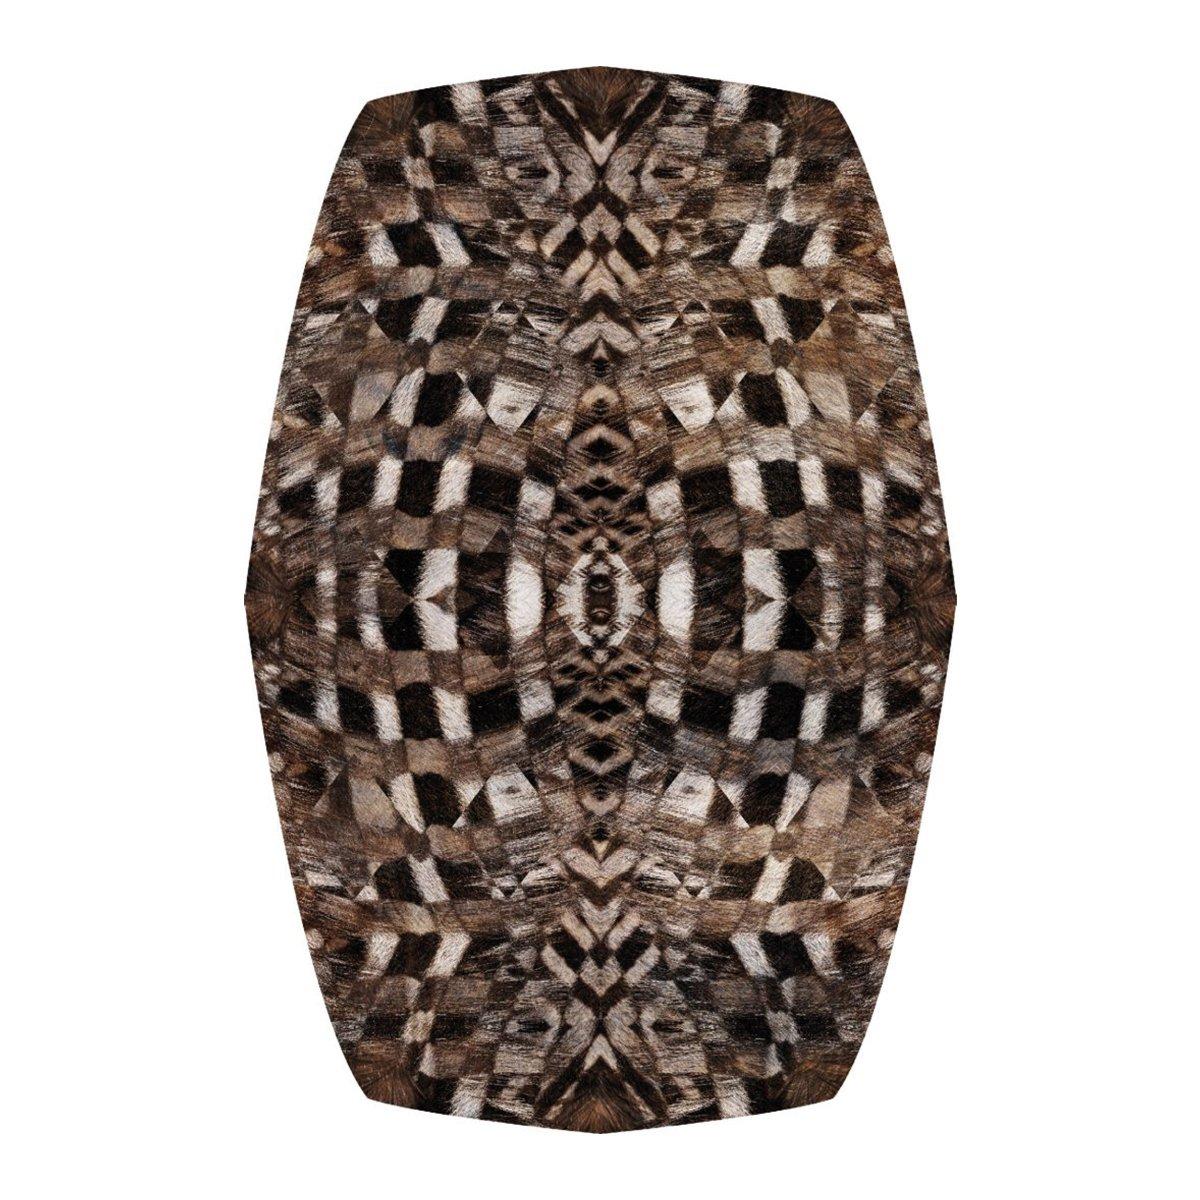 Moooi Carpets - Aristo Quagga Vloerkleed - 300 x 200 cm. - Low pile